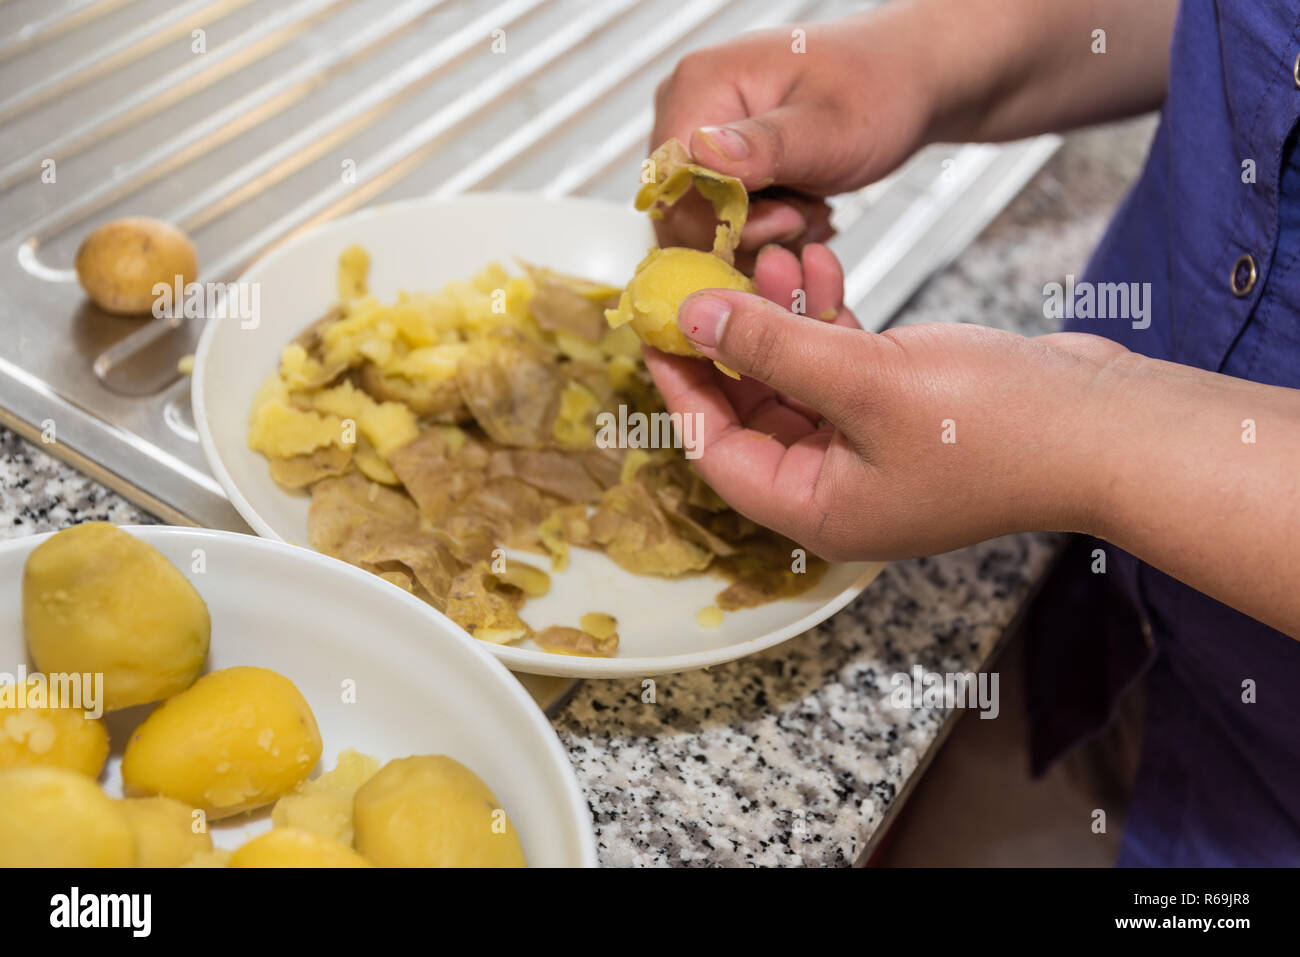 Patata Porner jacket potato woman fotos e imágenes de stock - alamy